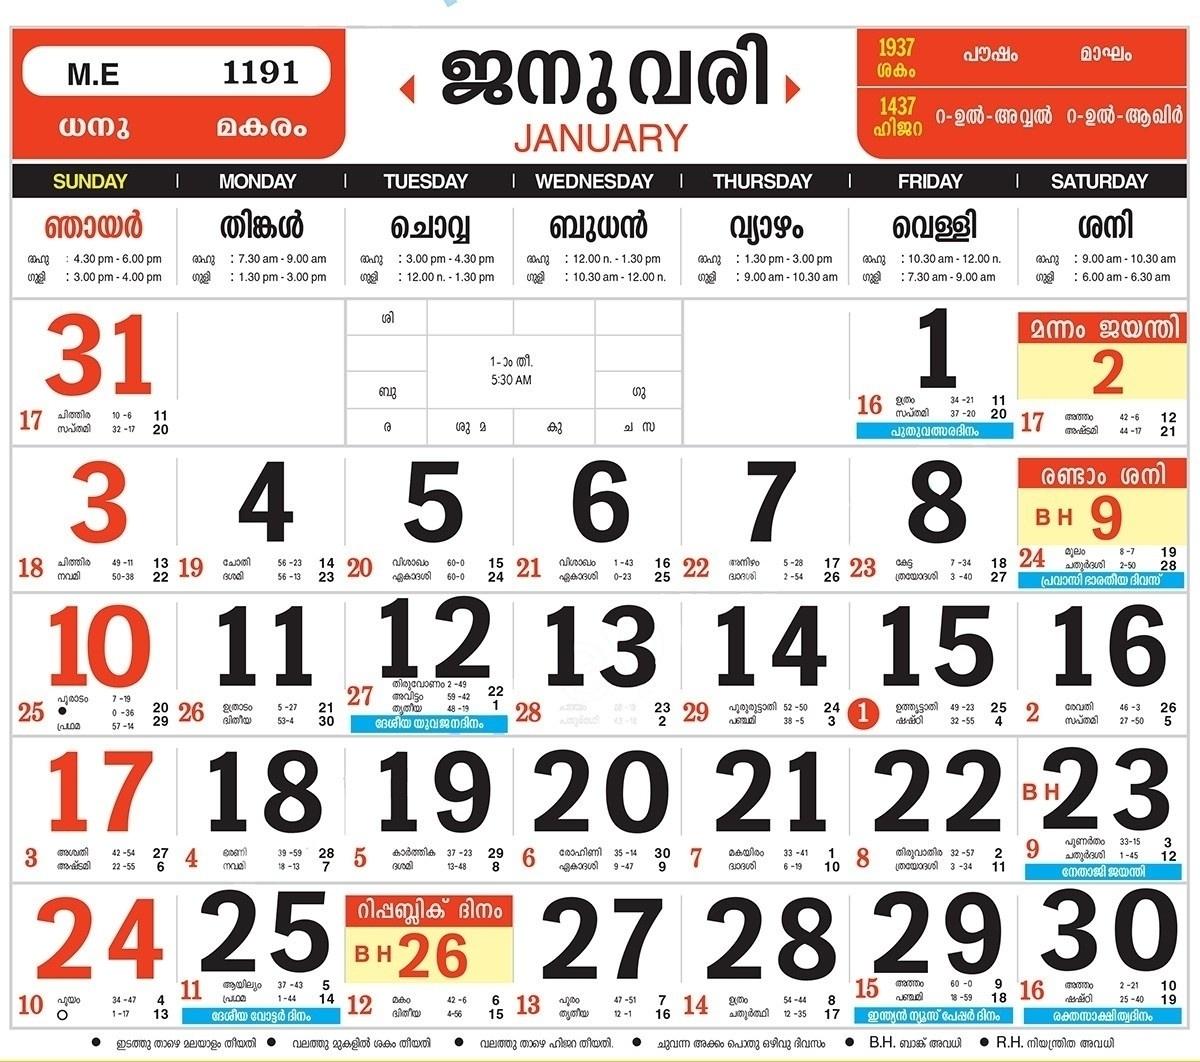 Kerala Govt Calendar 2018 September Template Calendar Design   Jazz Gear for Kerala September Holidays According To Calendar